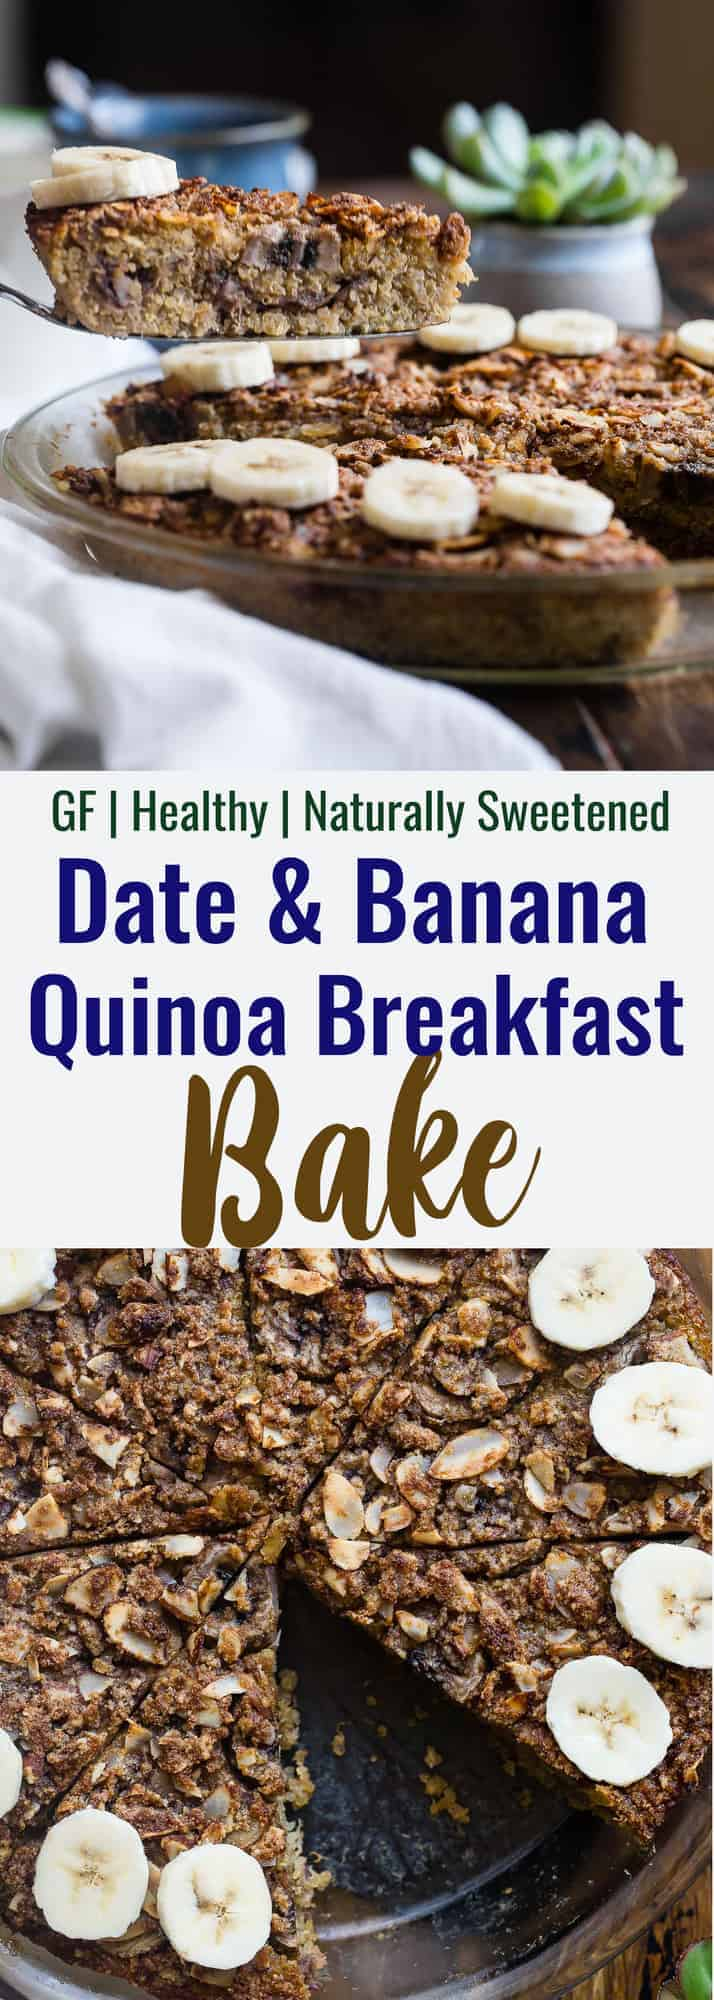 quinoa breakfast bake collage photo